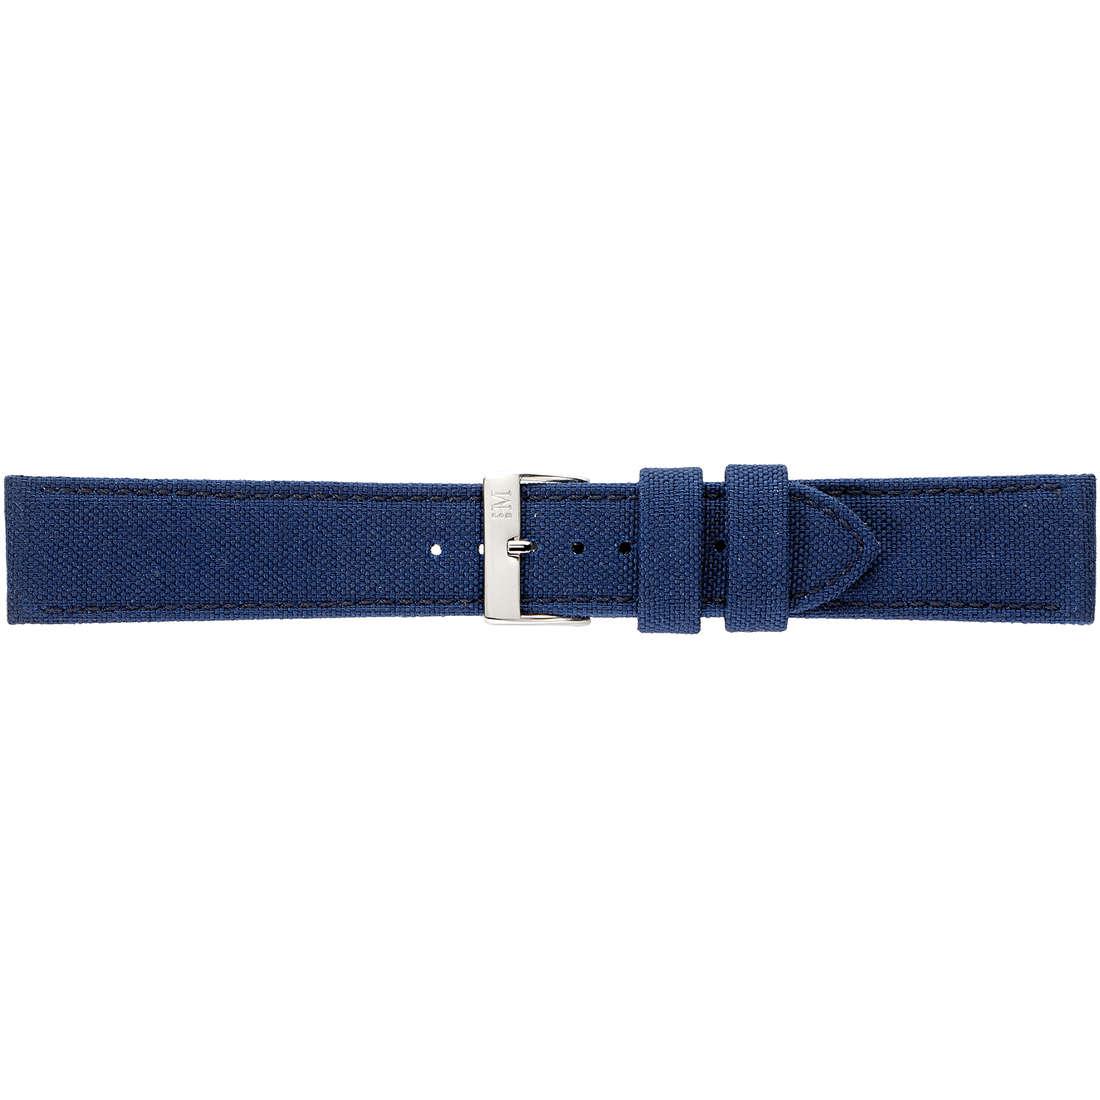 watch watch bands watch straps man Morellato Linea Sport A01U2779110061CR20